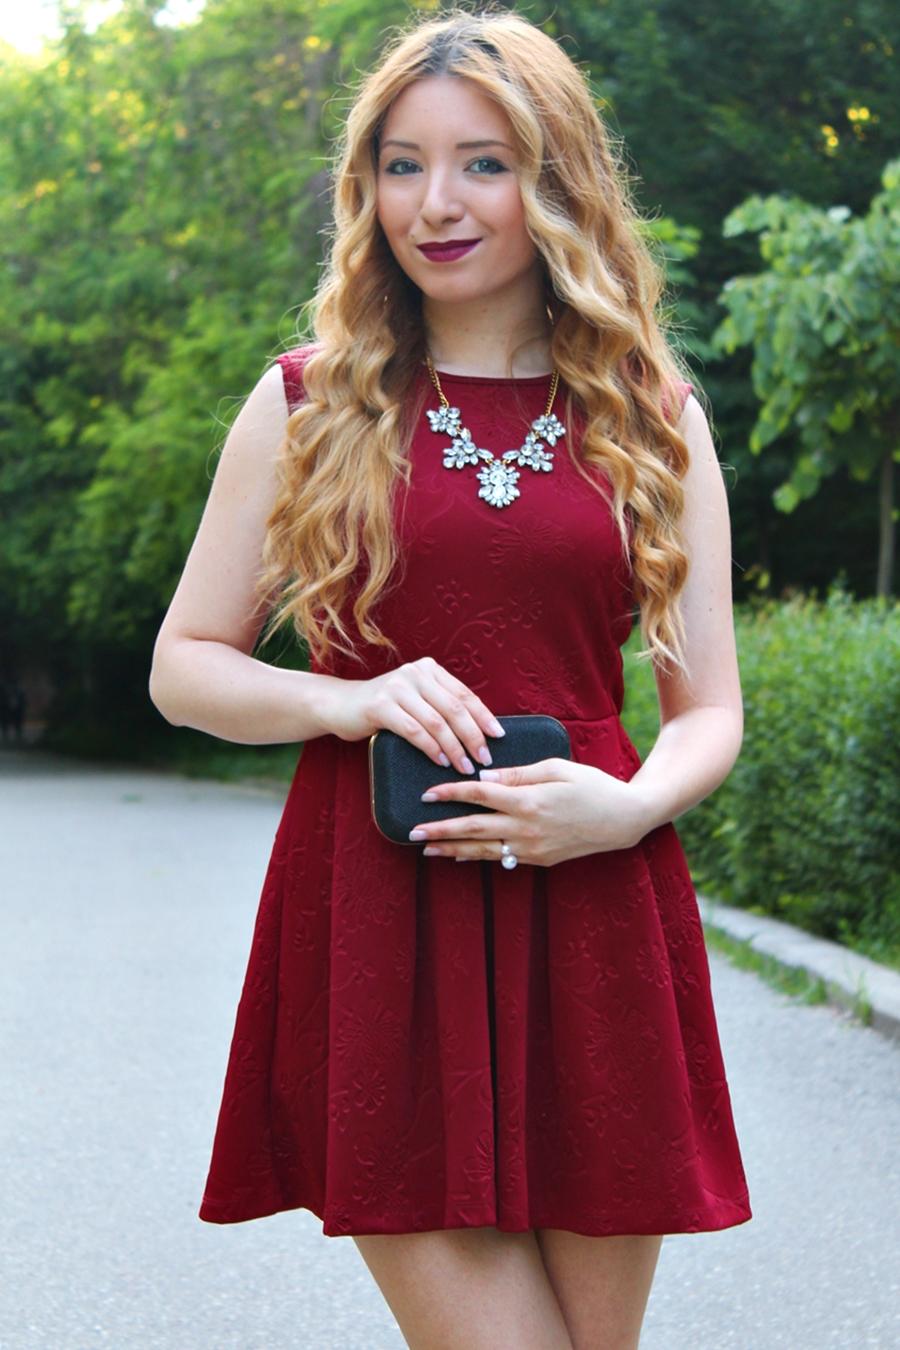 Andreea Pantilinescu - fashion blogger Pitesti, Arges